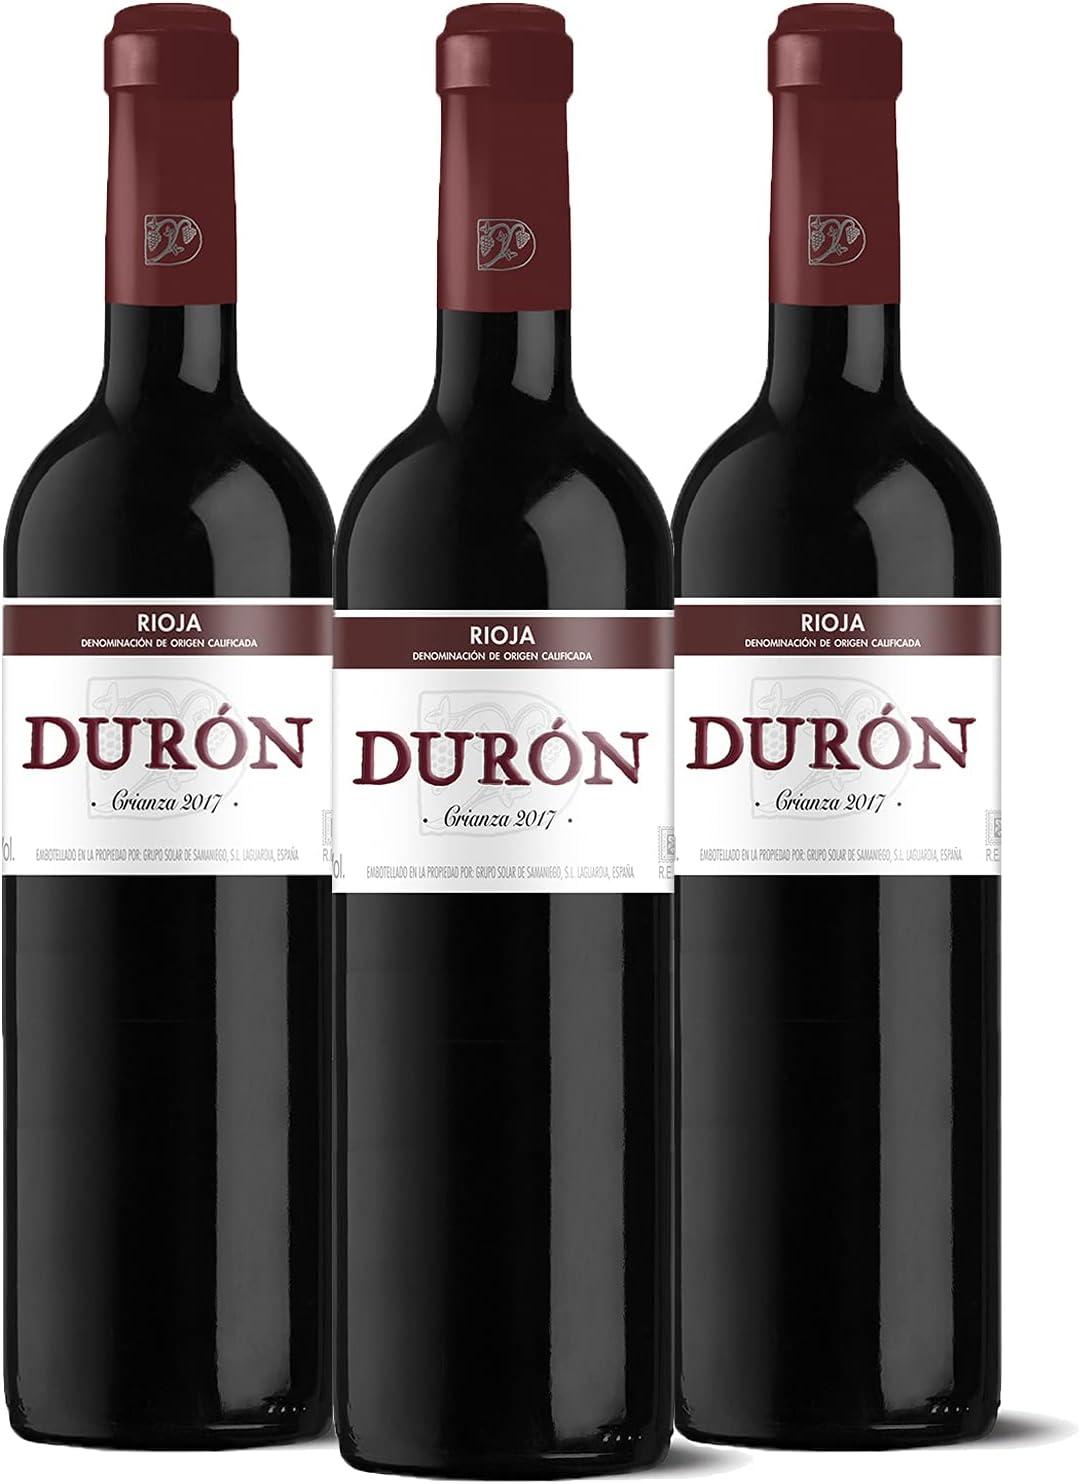 Durón – Vino Tinto Crianza 2017 Denominación de Origen Calificada Rioja, Variedad Tempranillo, 12 meses en barrica – Caja de 3 botellas x 750 ml – Total: 2250 ml